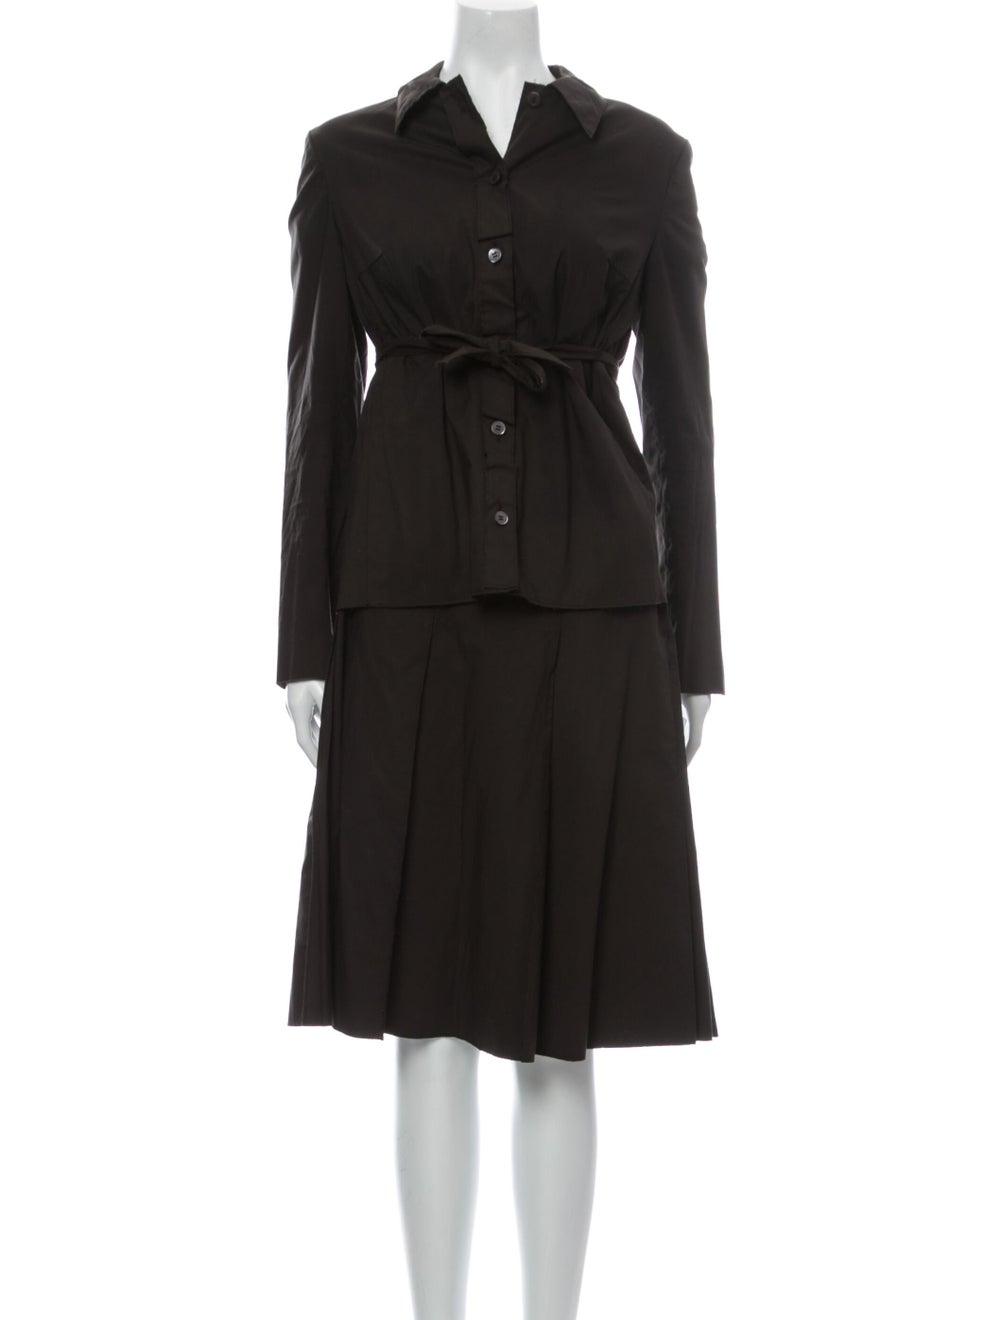 Prada Vintage 1990's Skirt Set Brown - image 1